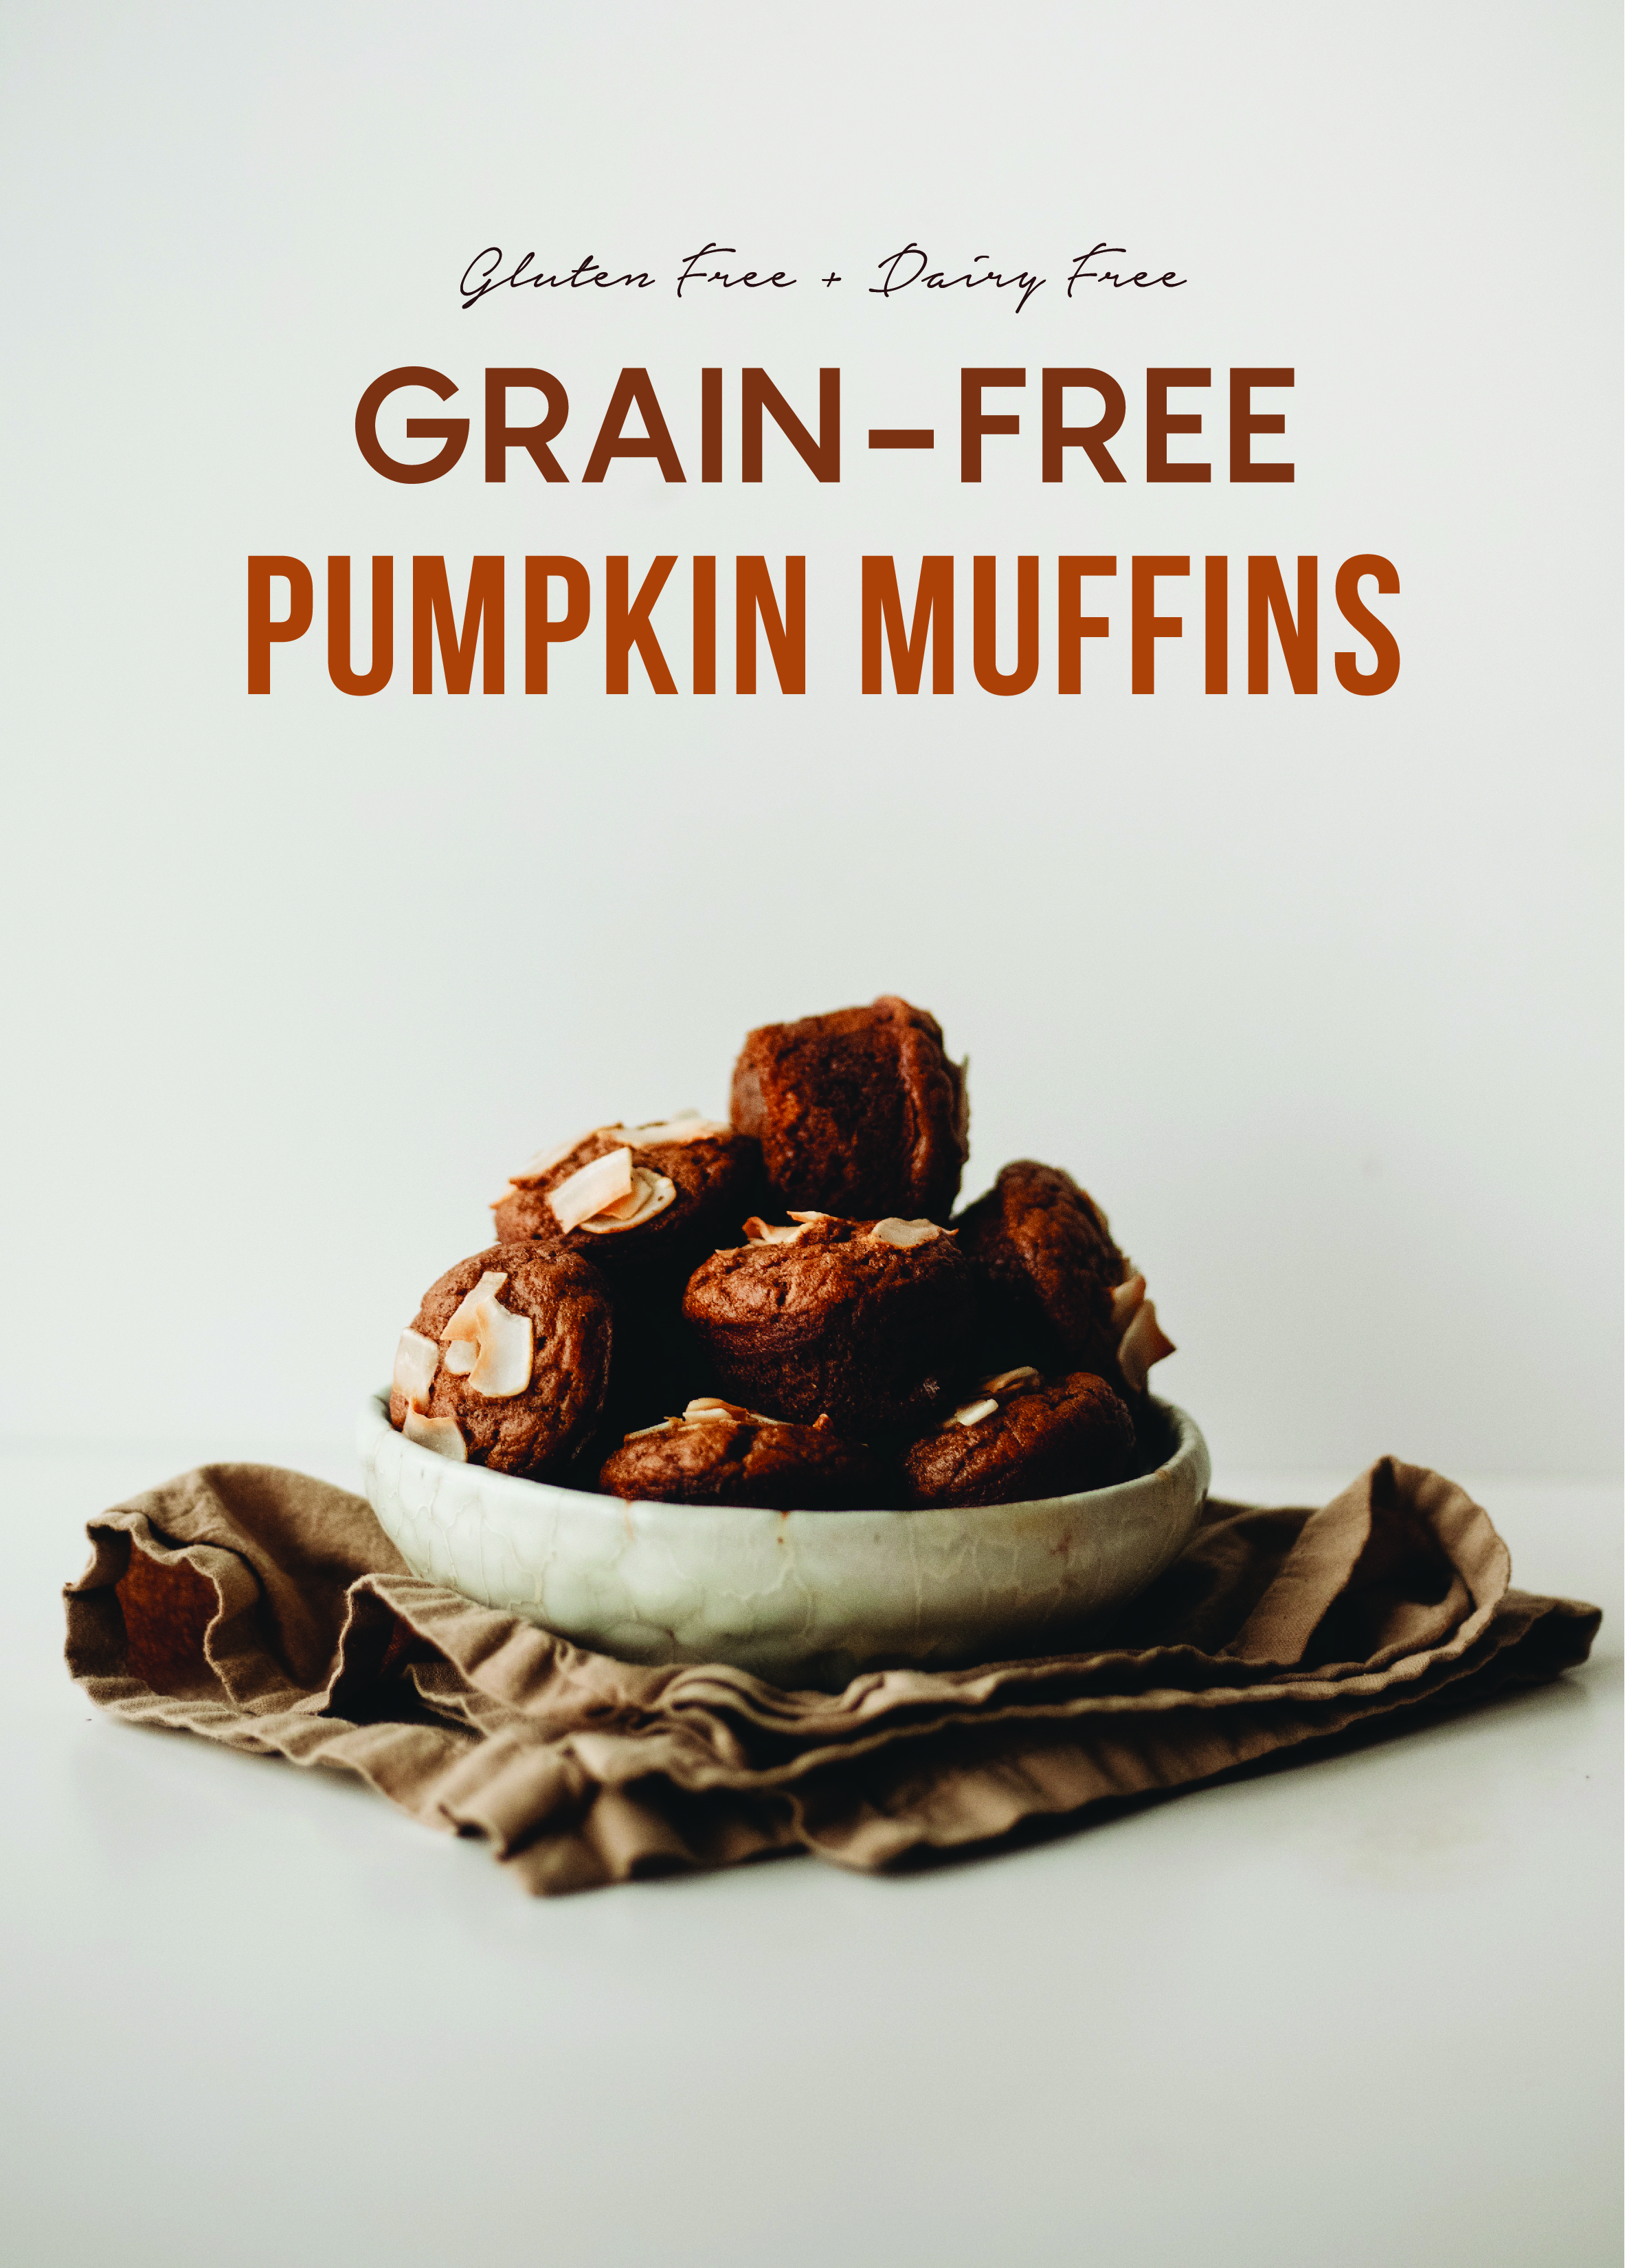 Healthy grain free pumpkin muffins recipe